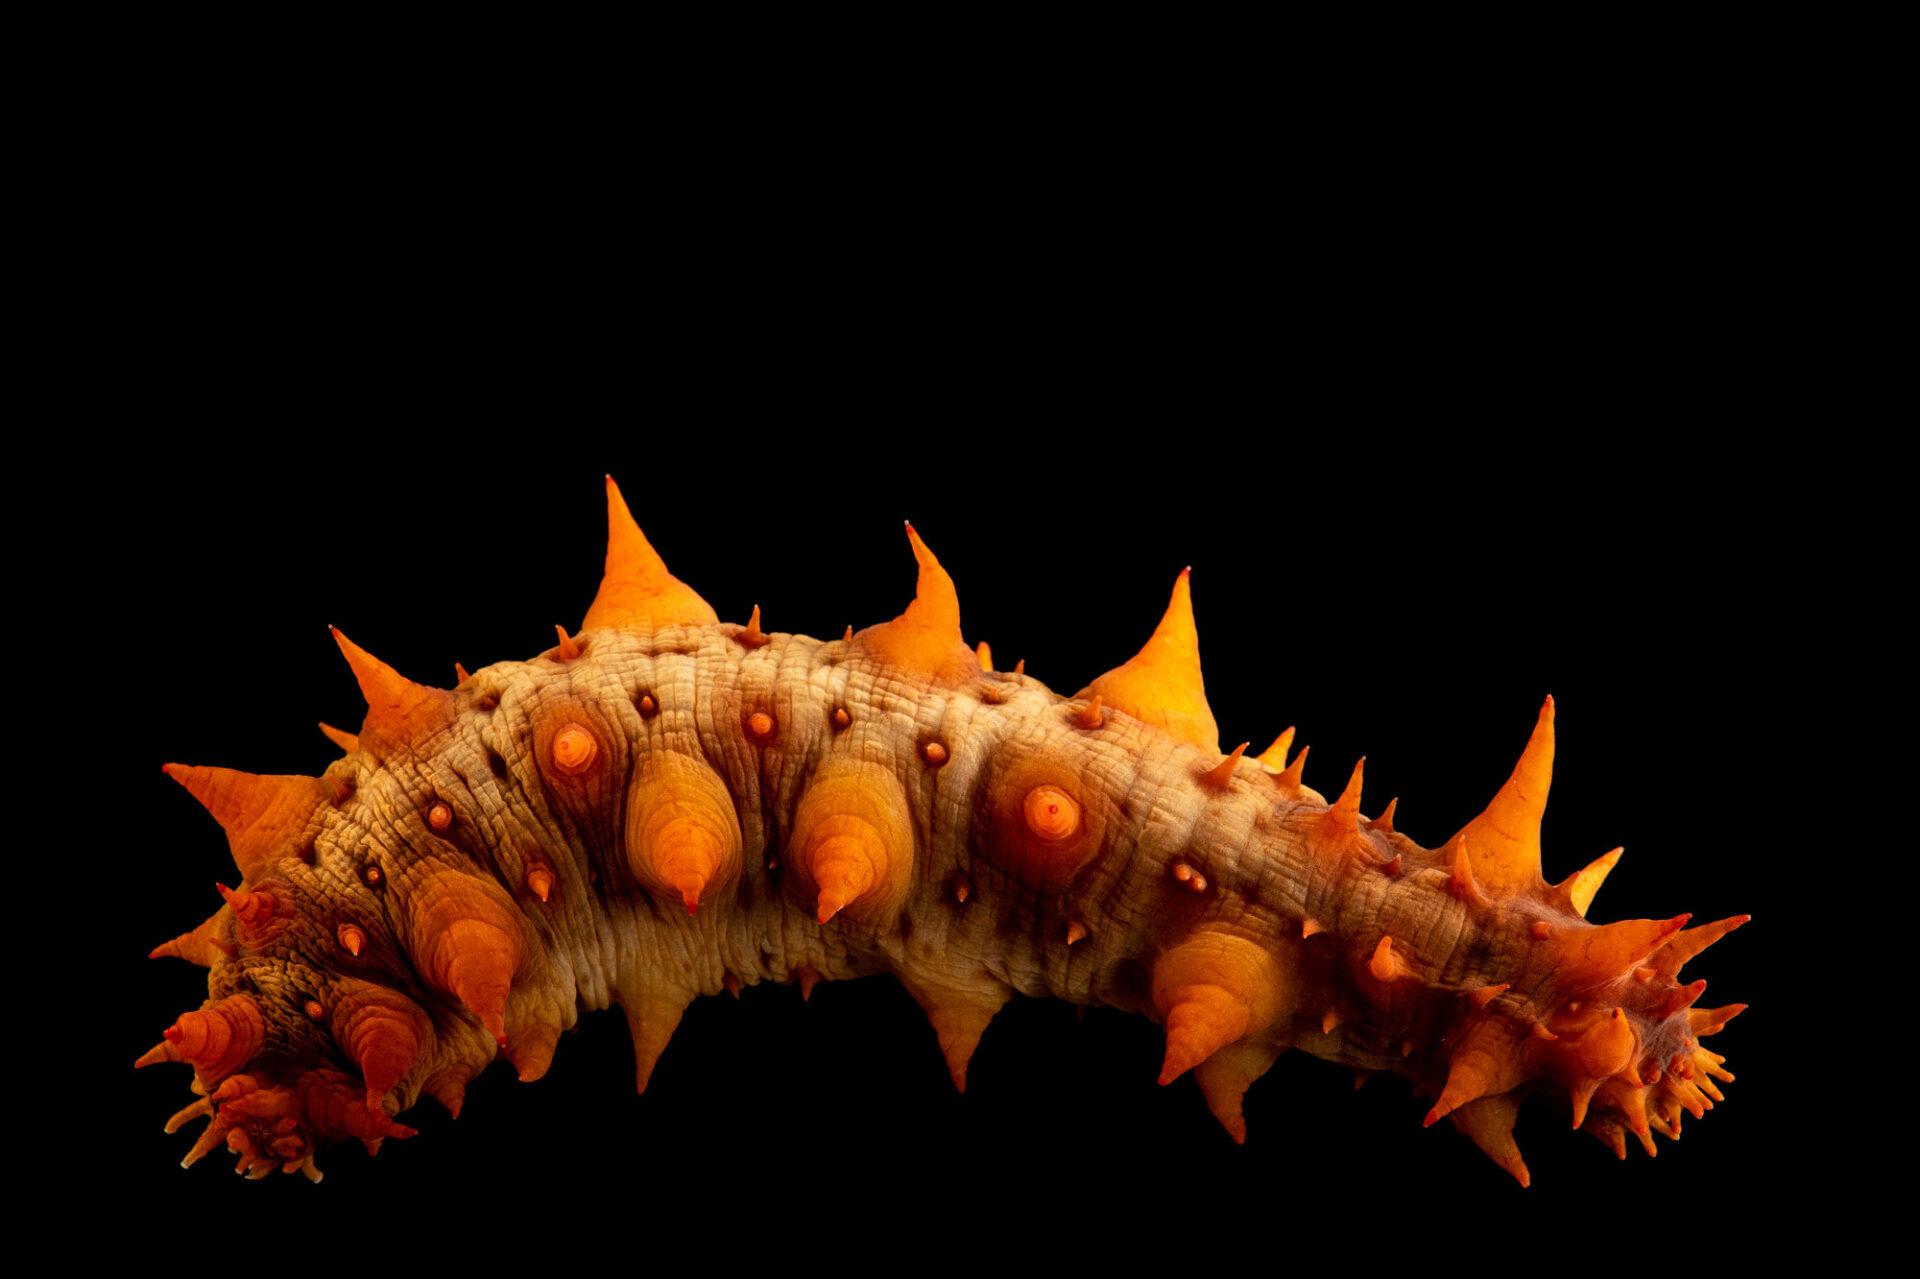 Photo: A California giant sea cucumber (Apostichopus californicus) at Riverbanks Zoo and Garden.